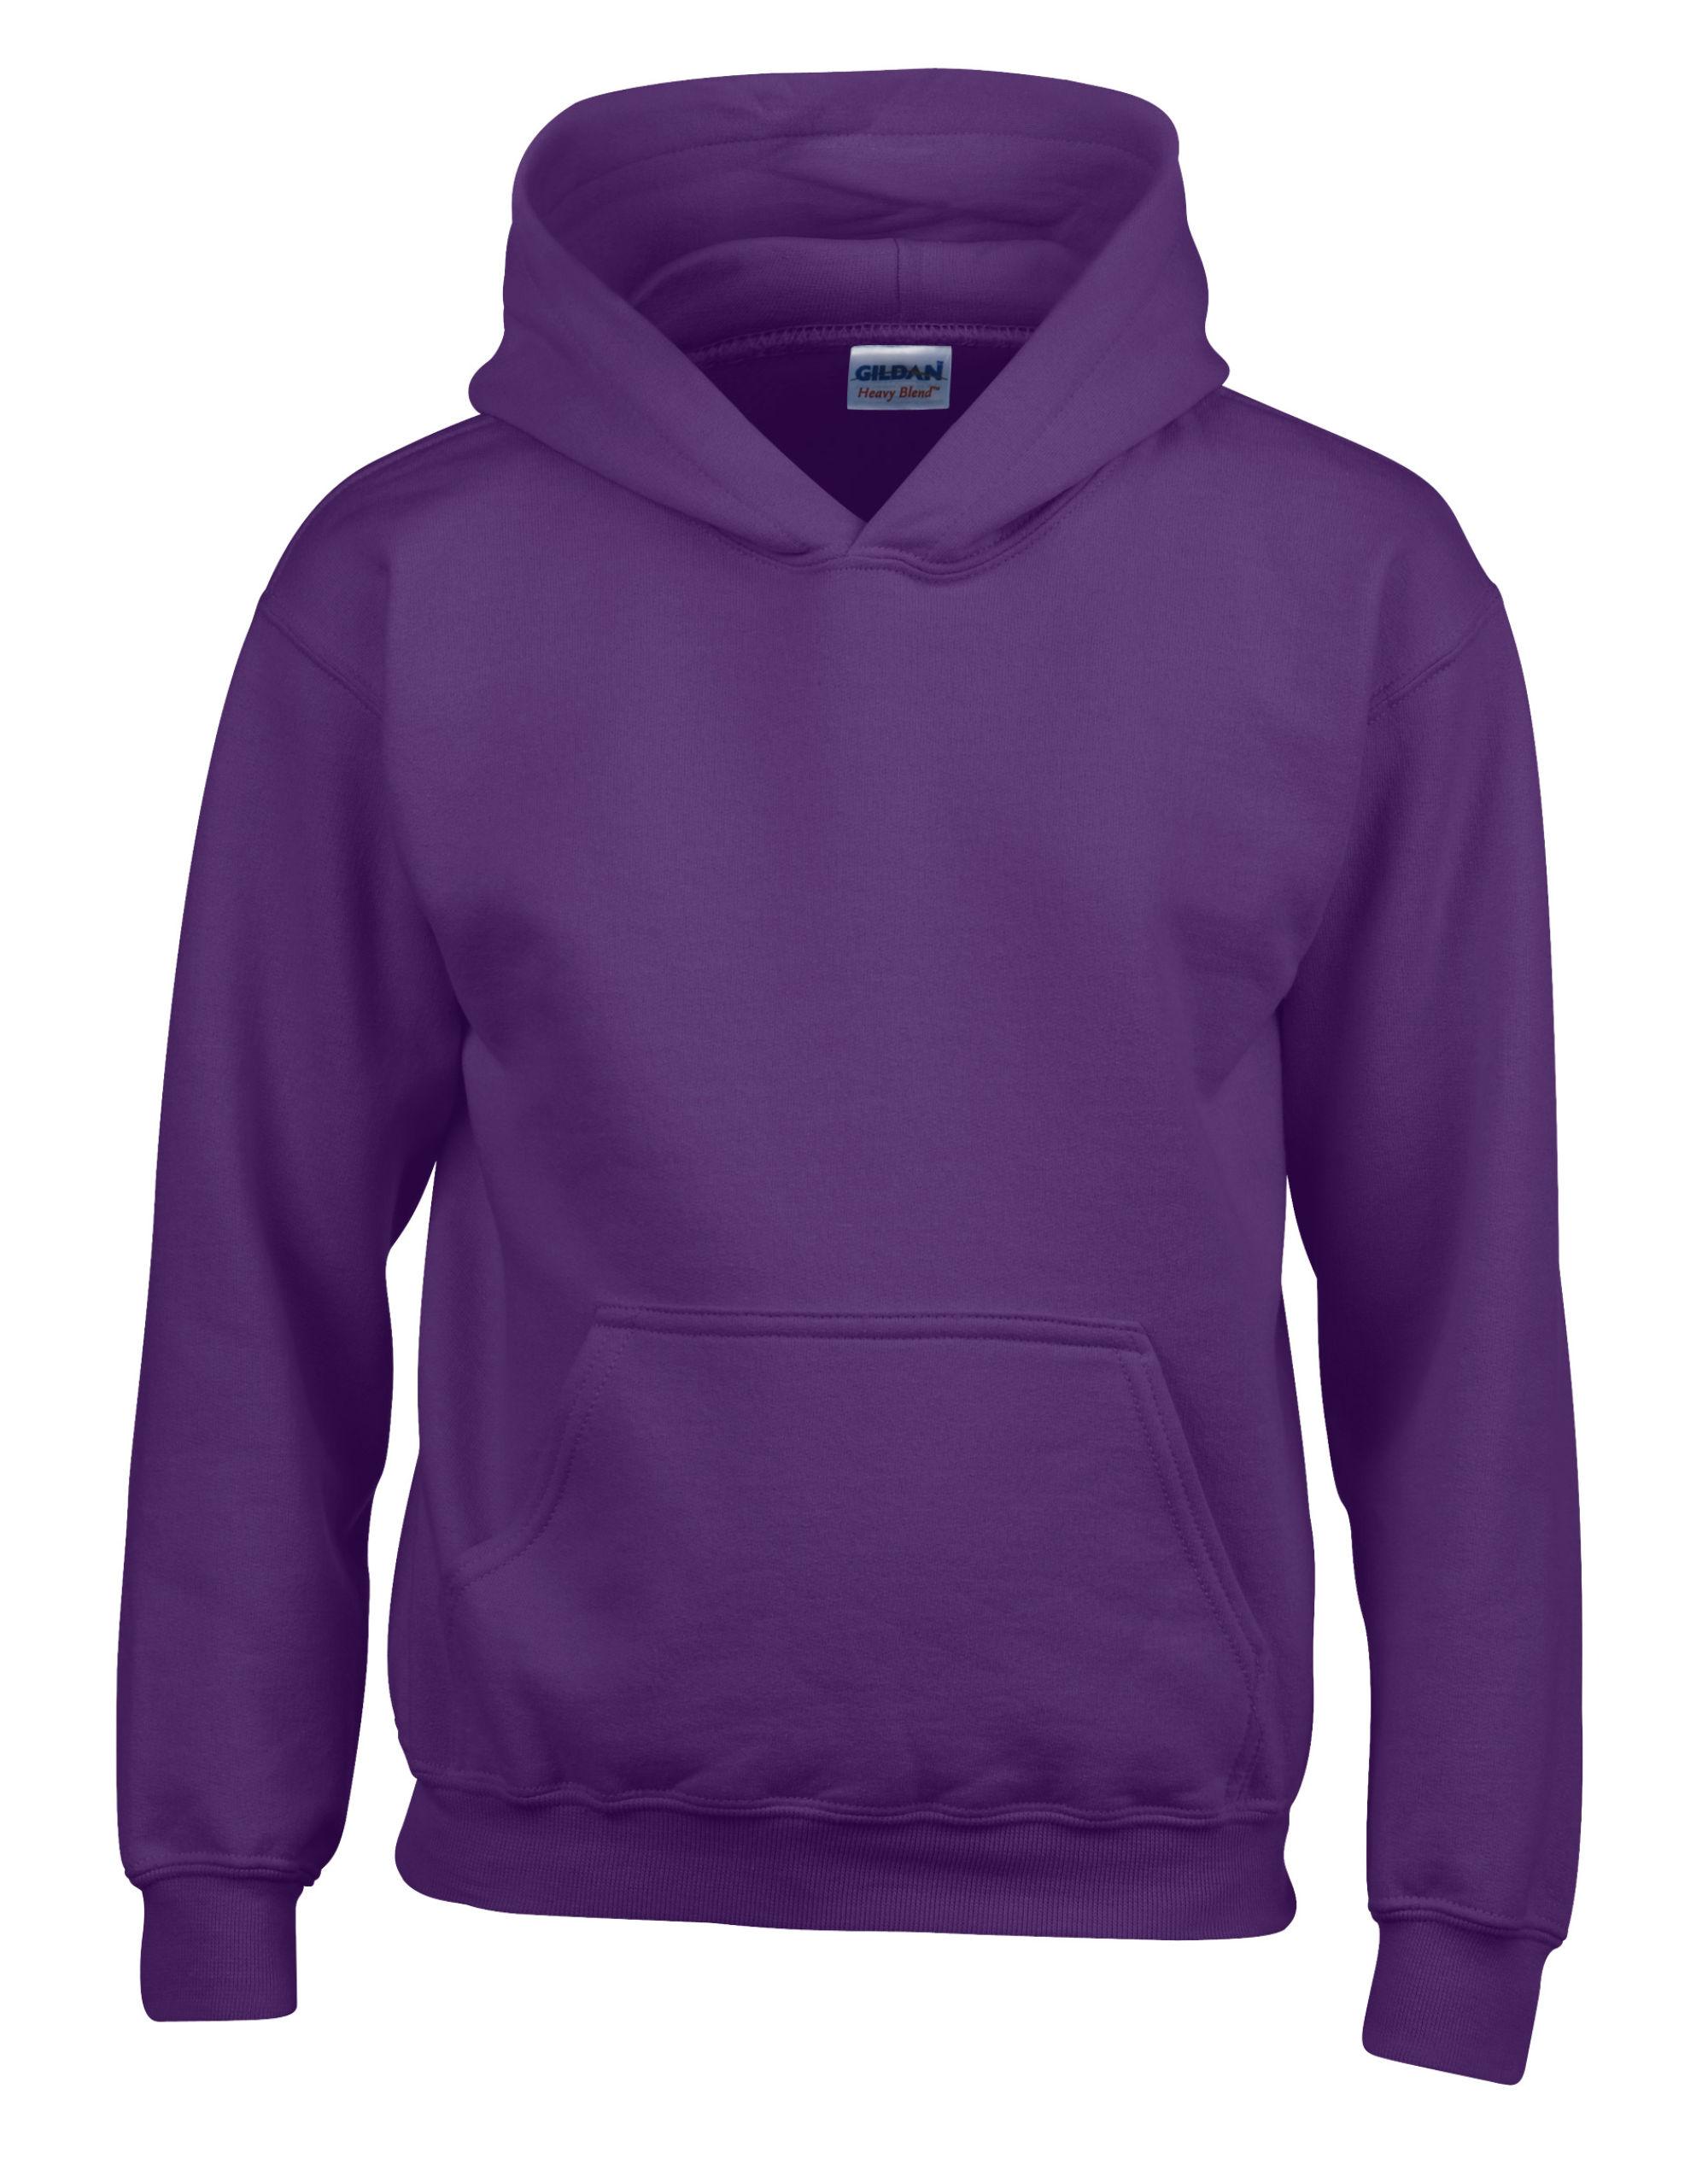 Childrens Hooded Sweatshirt